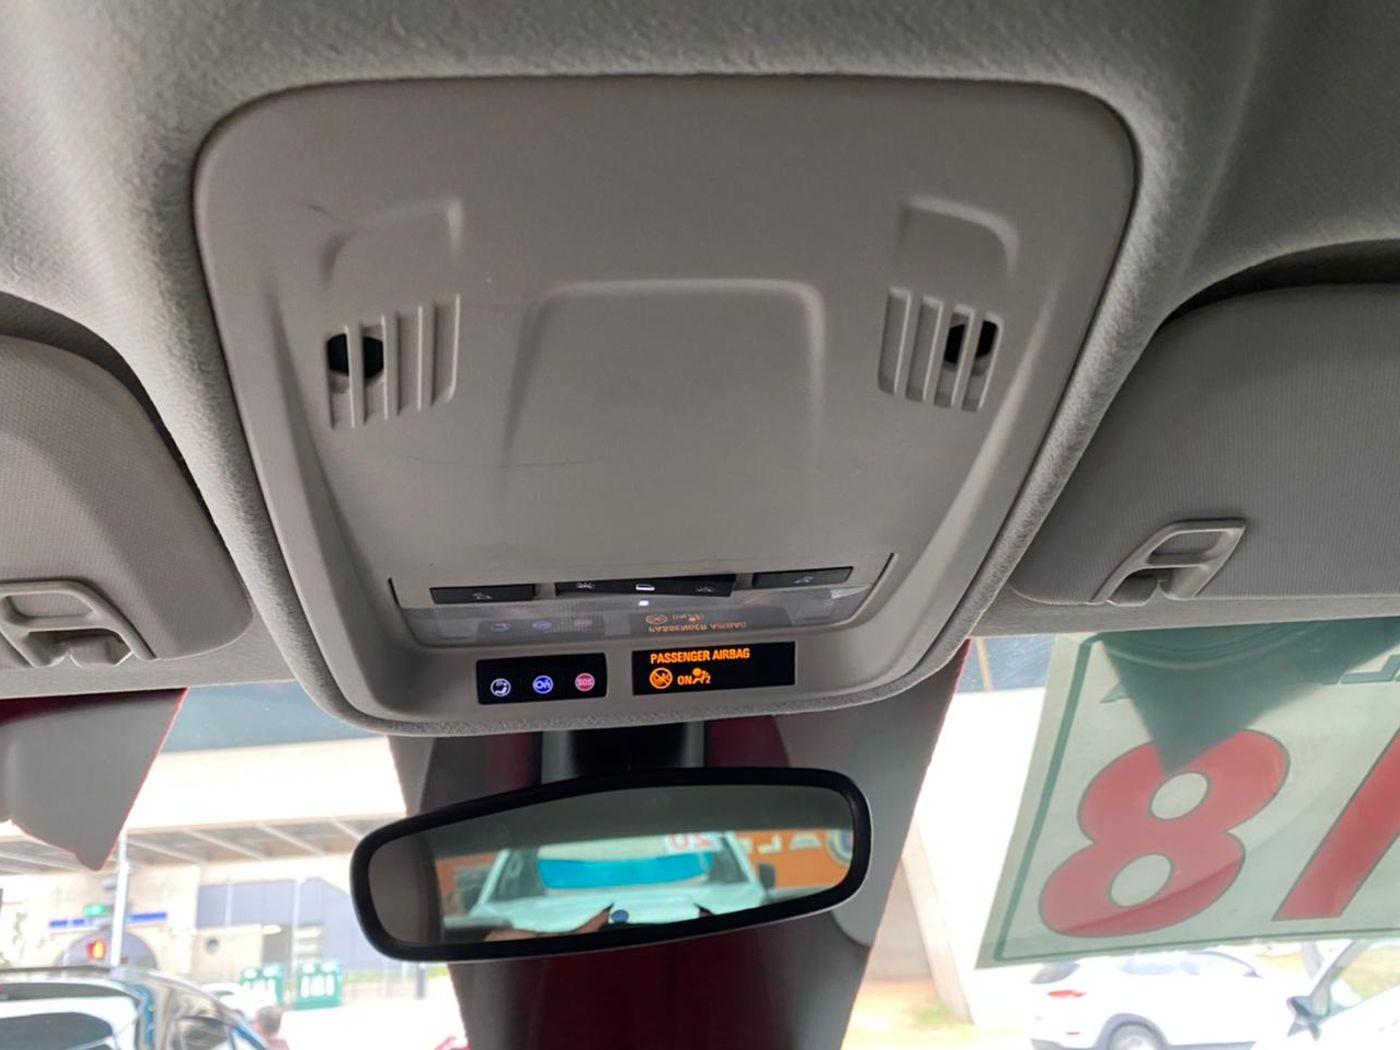 Chevrolet CRUZE LTZ 1.4 16V Turbo Flex 4p Aut.